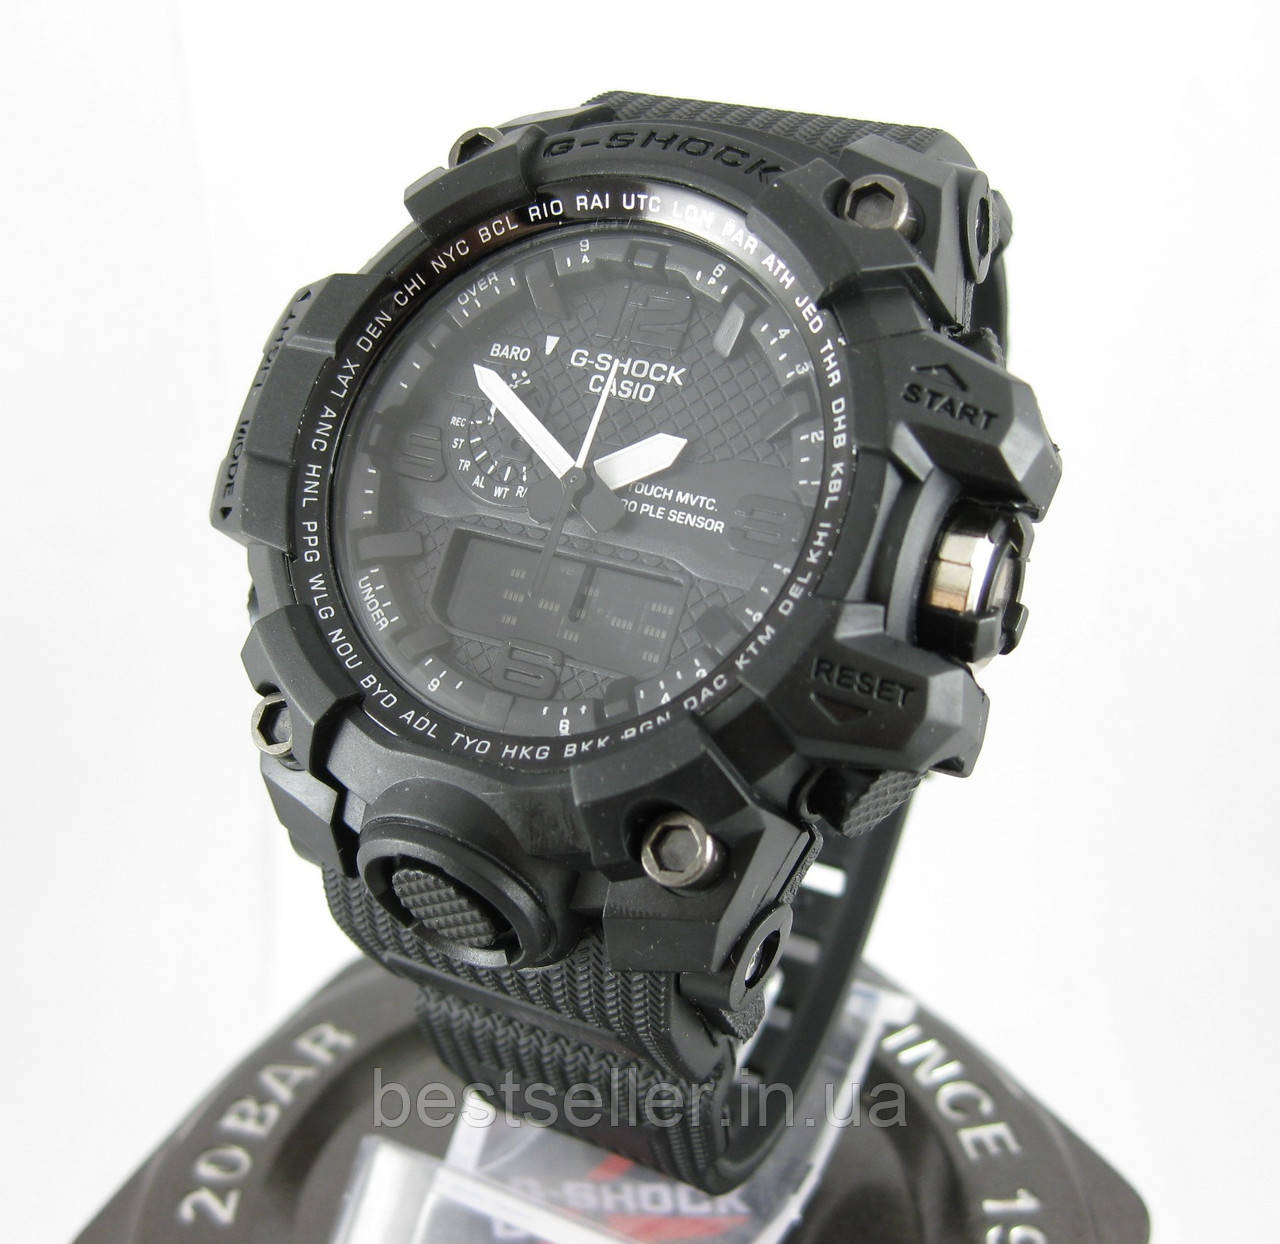 b4095289b773 Часы Casio G-Shock GWG-1000 Black. Реплика ТОП качества!, фото ...